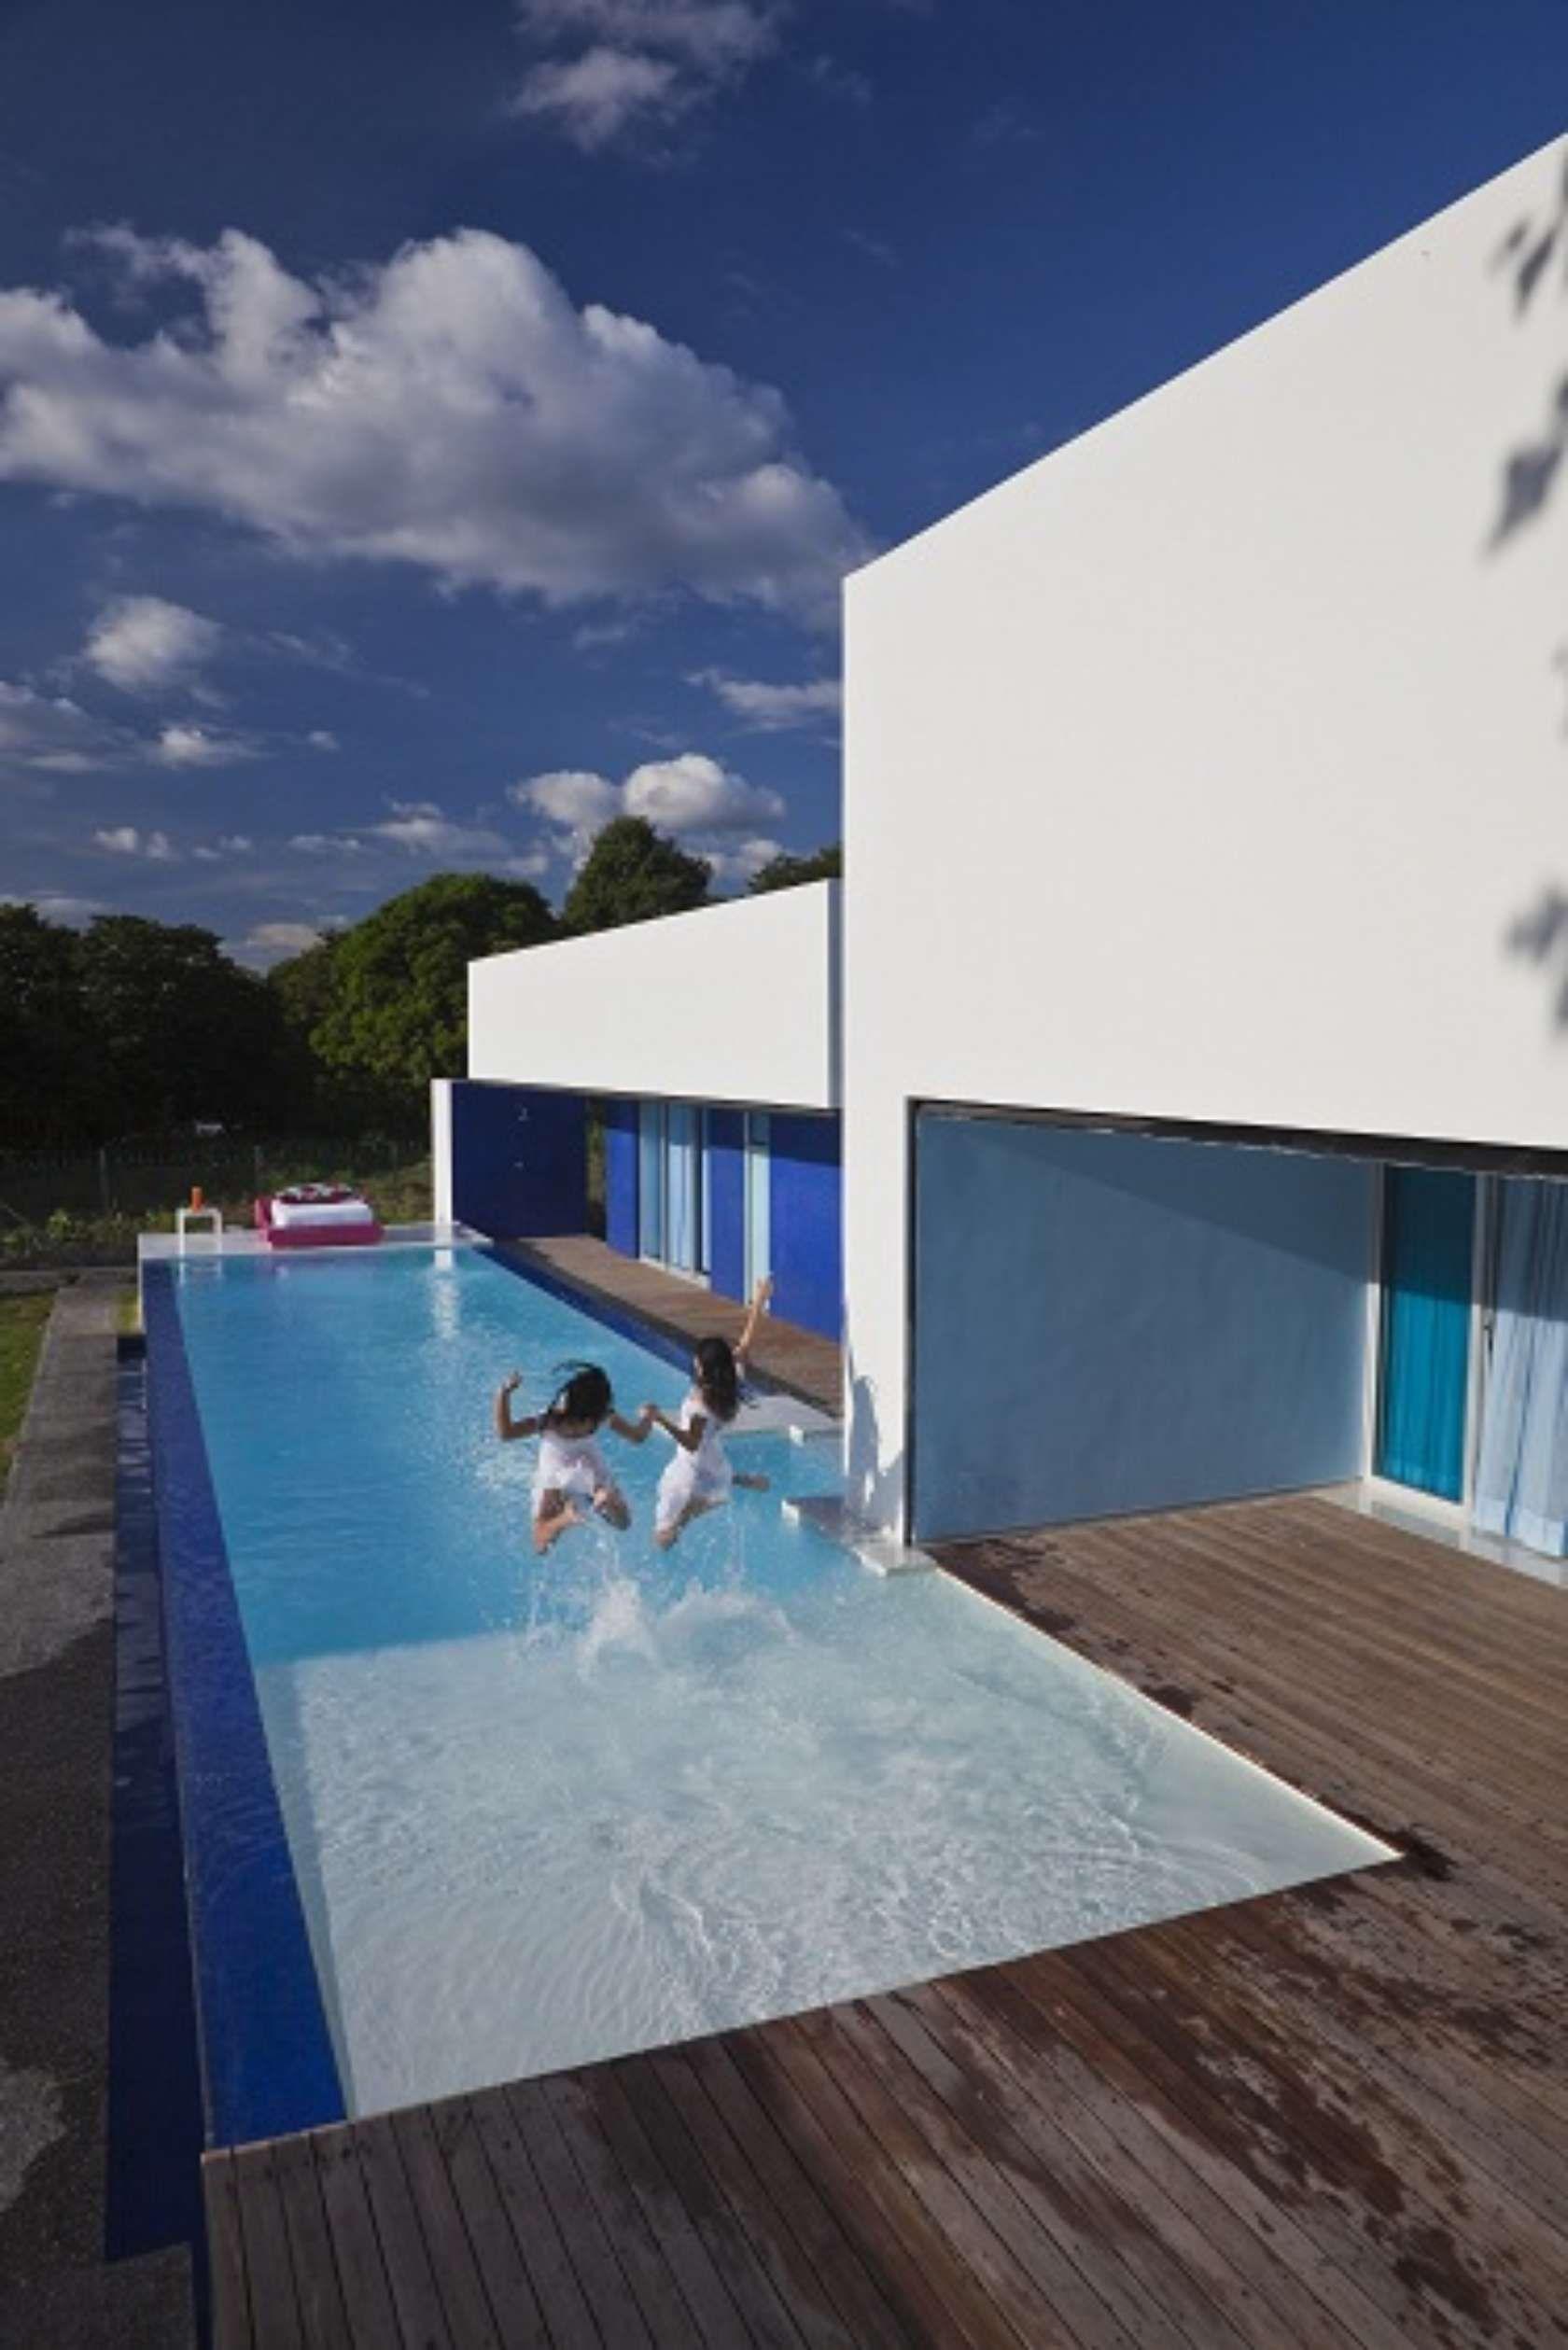 Casa con piscina para nataci n casas y todo tipo de for Diseno piscinas modernas colombia